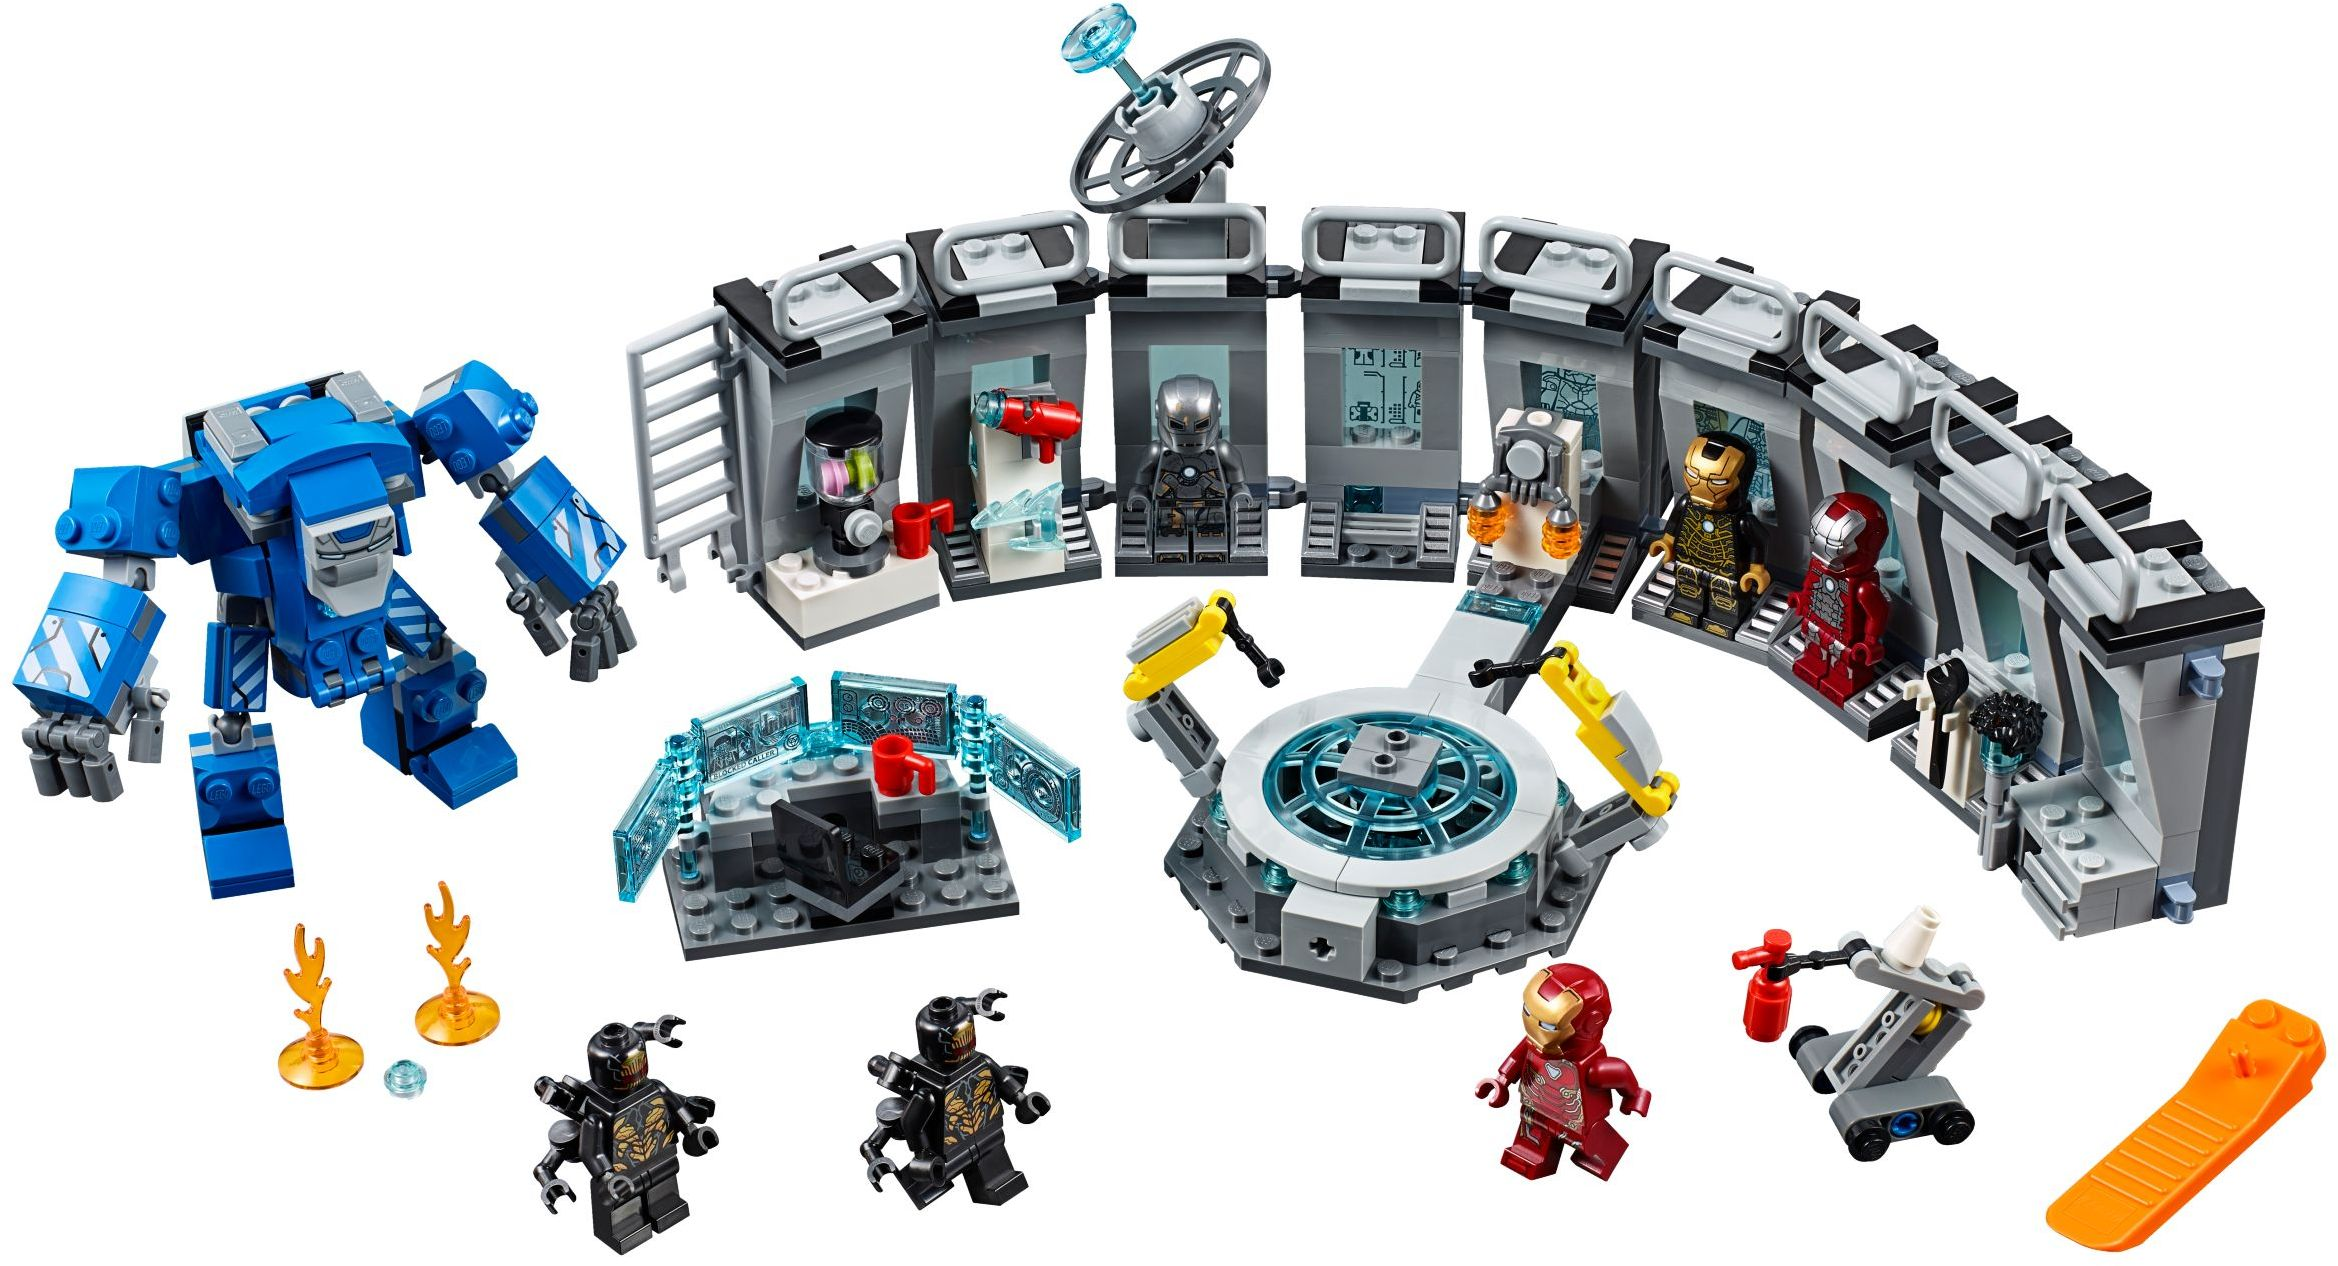 Lego Marvel Avengers Figur Nebula aus Set 76131